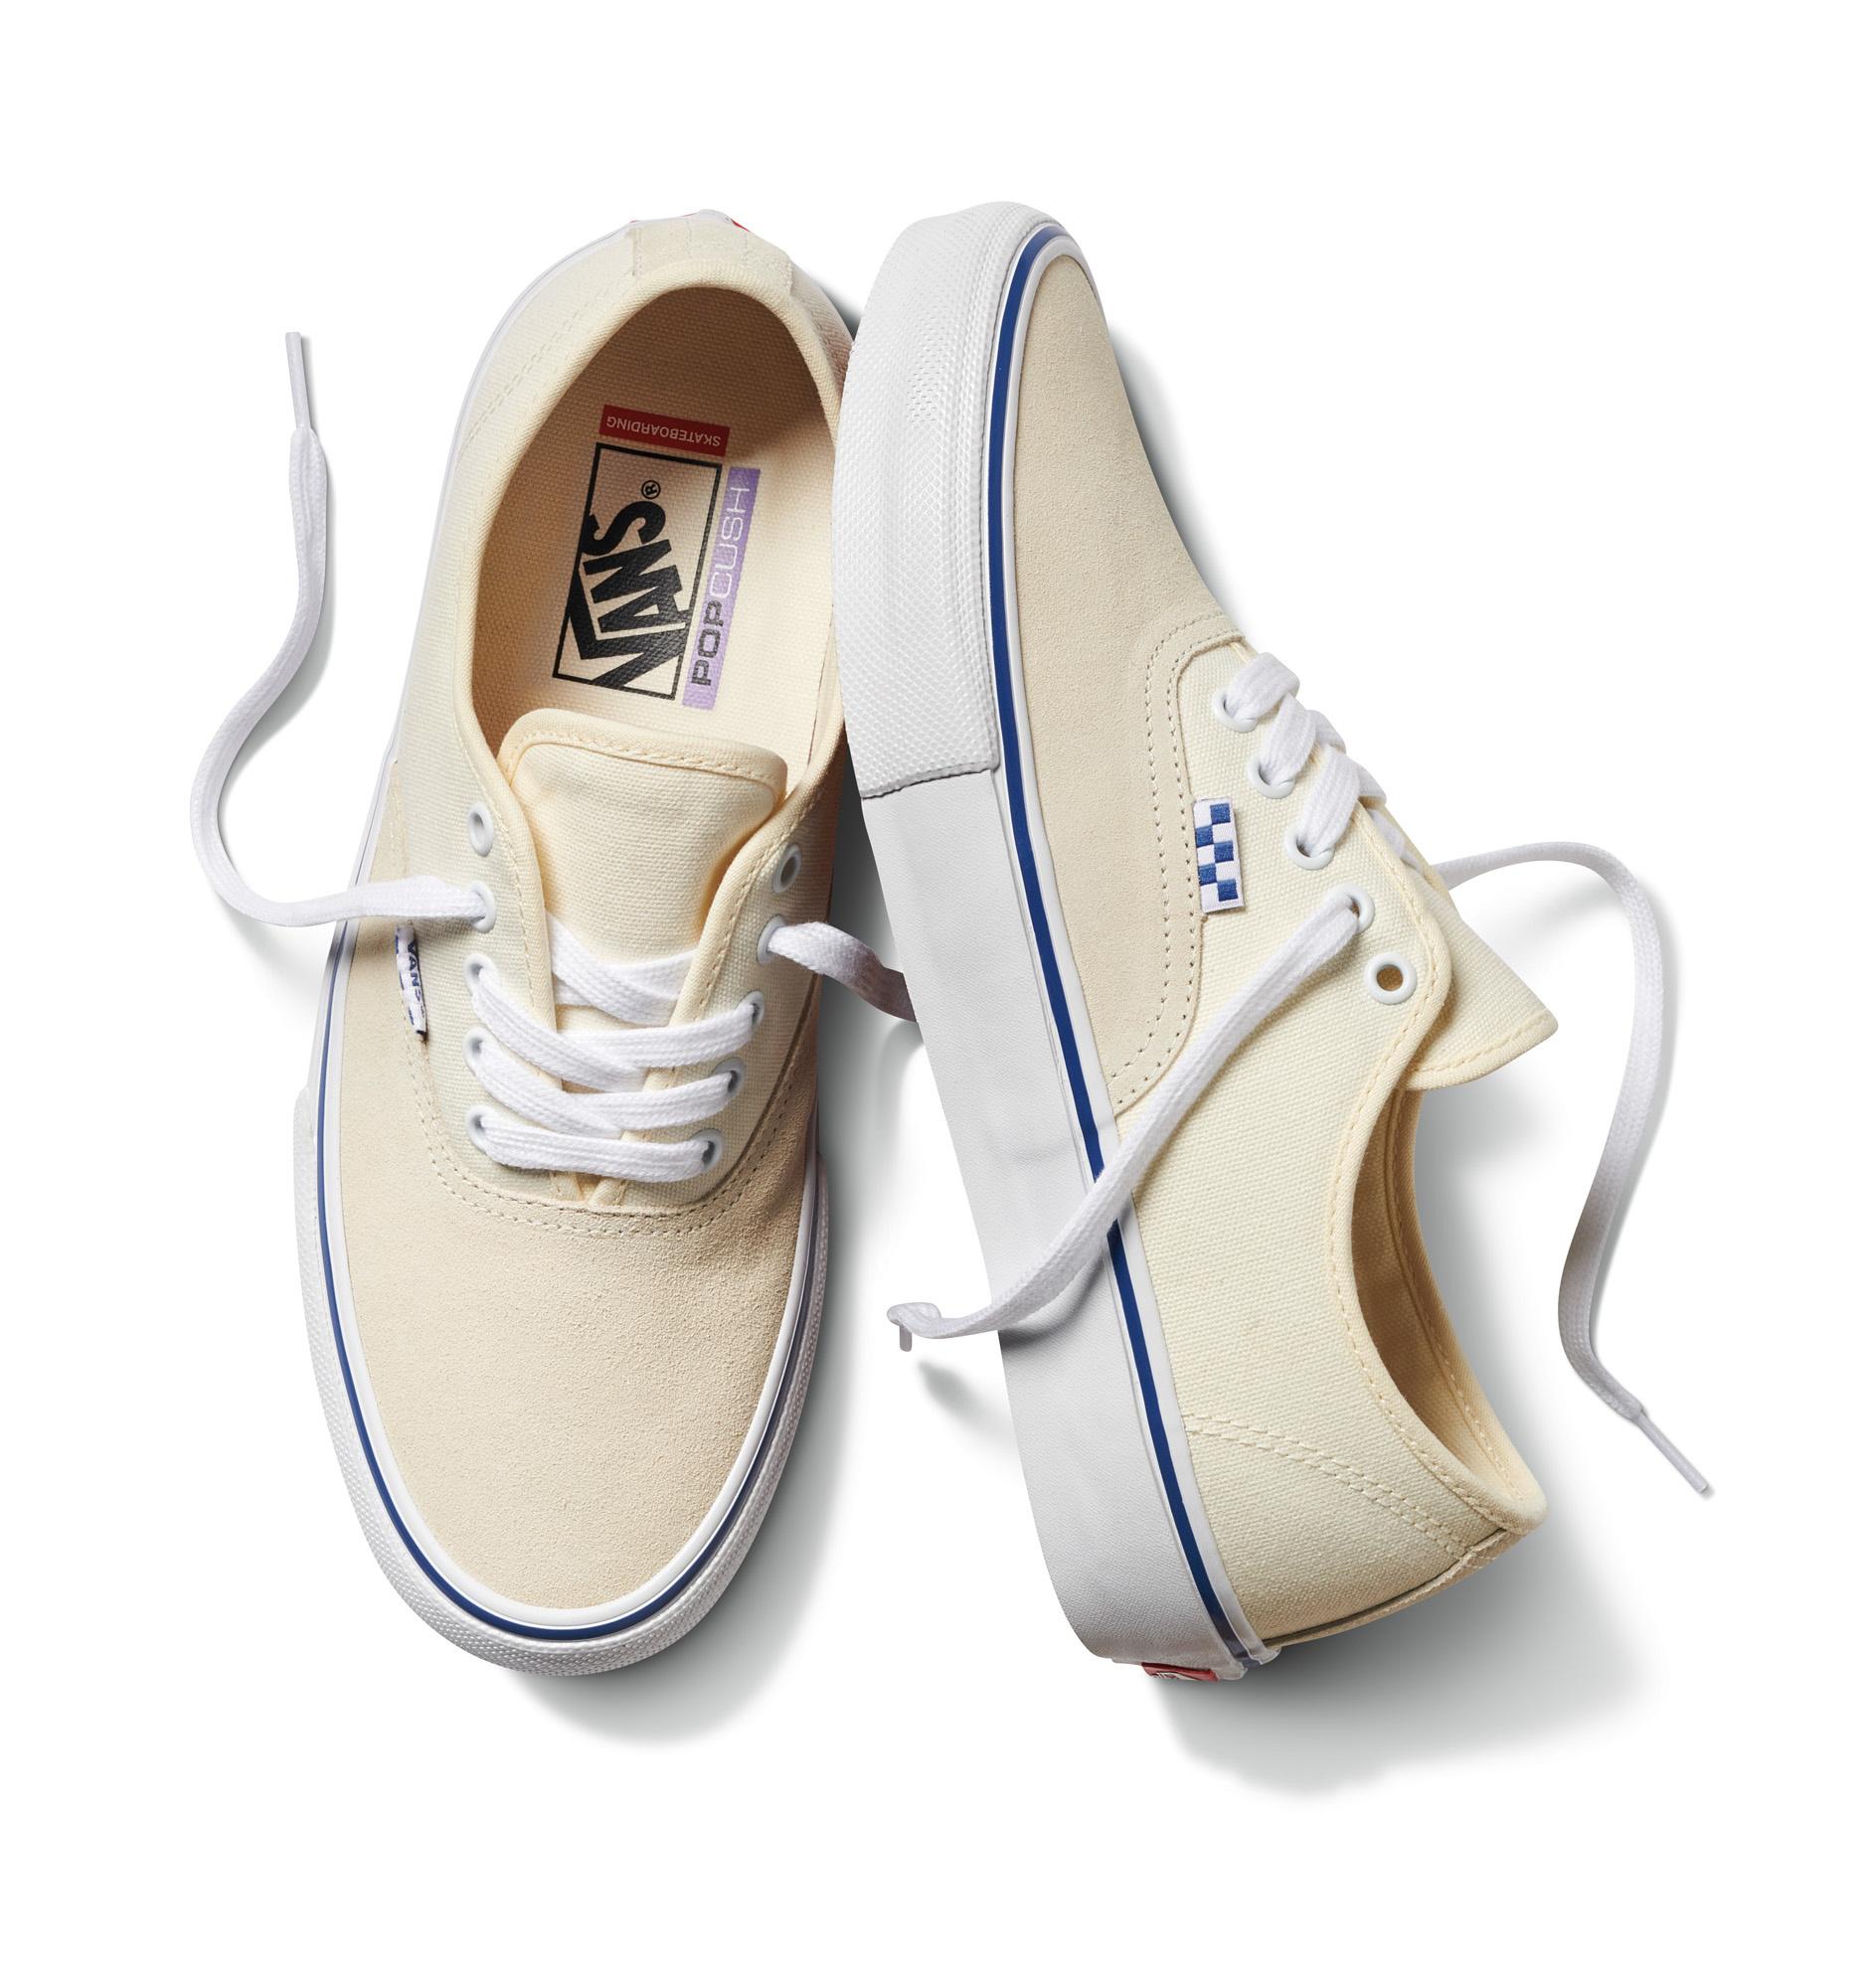 Vans Skate Authentics Off white navy